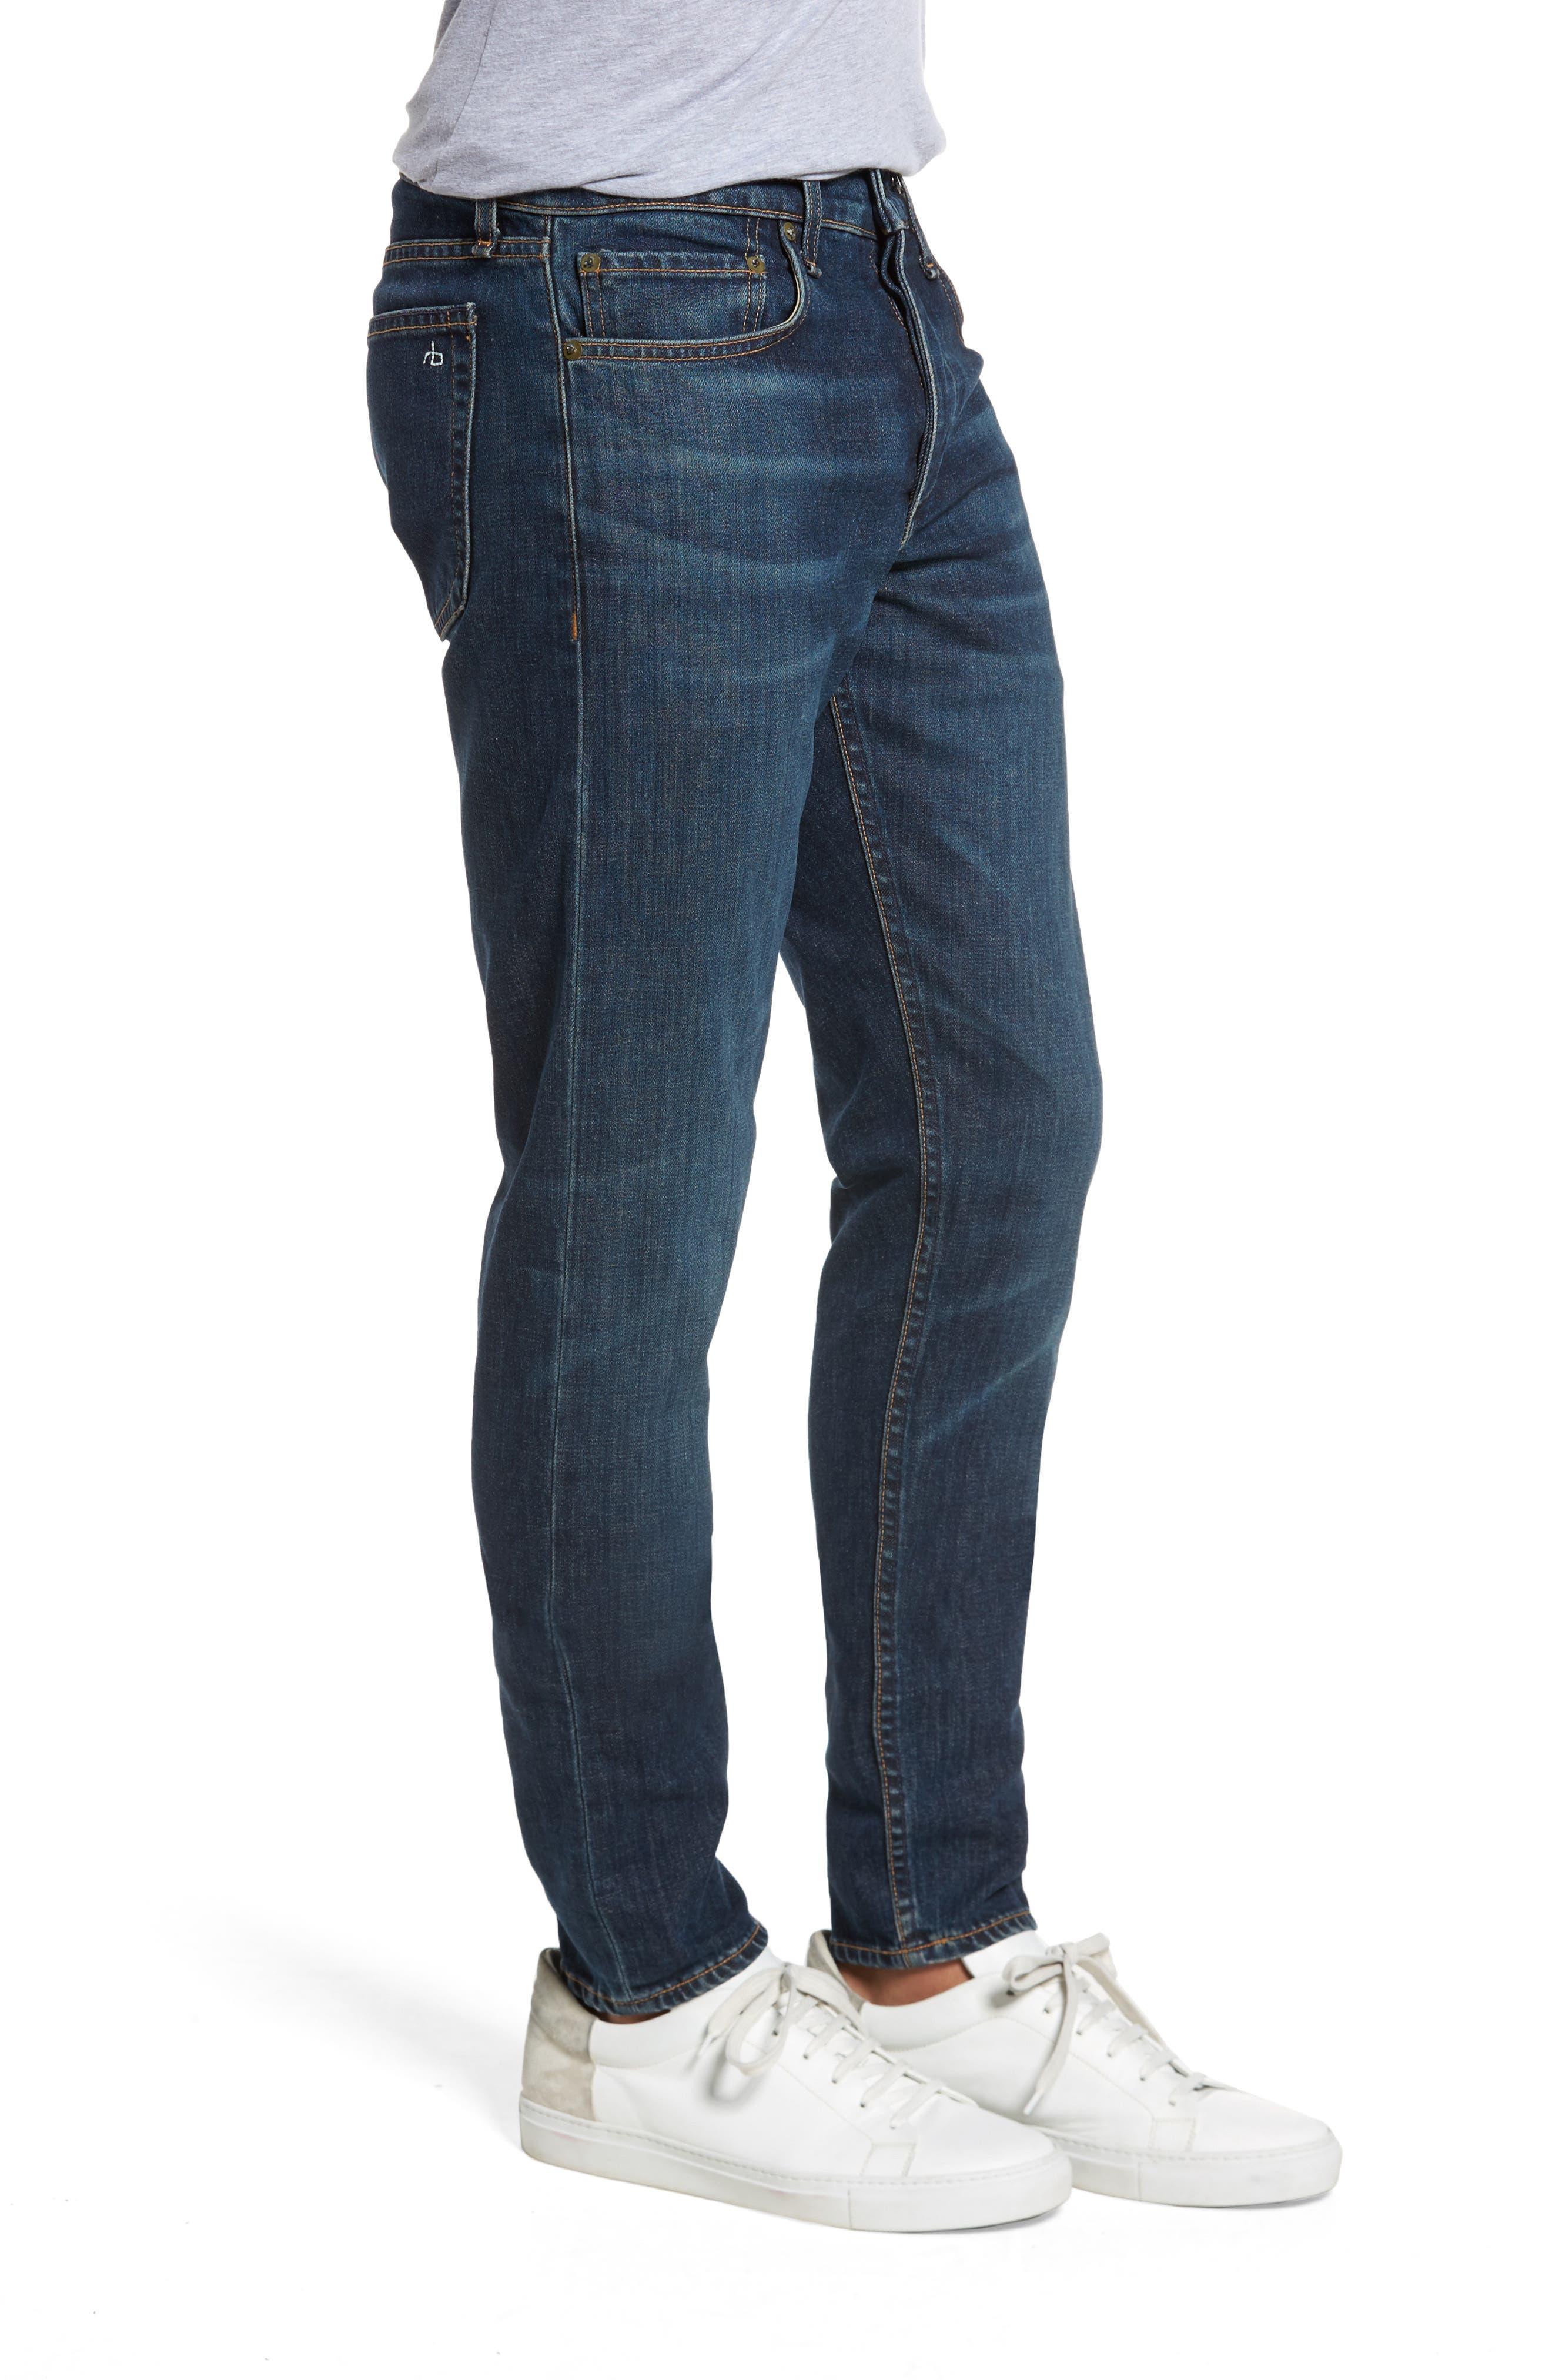 RAG & BONE,                             Fit 1 Skinny Fit Jeans,                             Alternate thumbnail 3, color,                             420